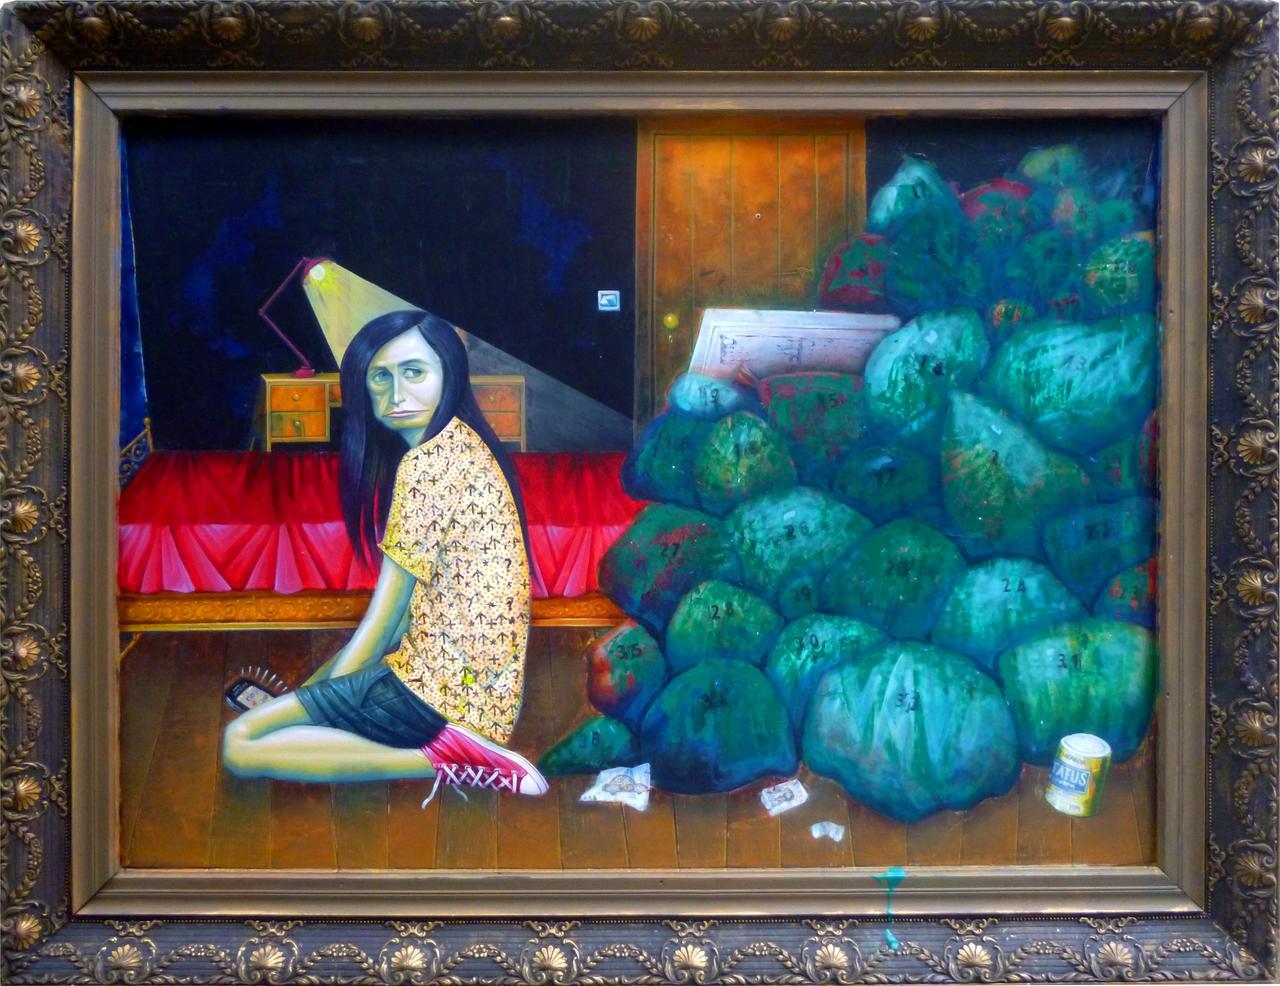 Kostas Lavdas, The Offspring, 92.4 x 71 cm, acrylic, marker, ink on wood